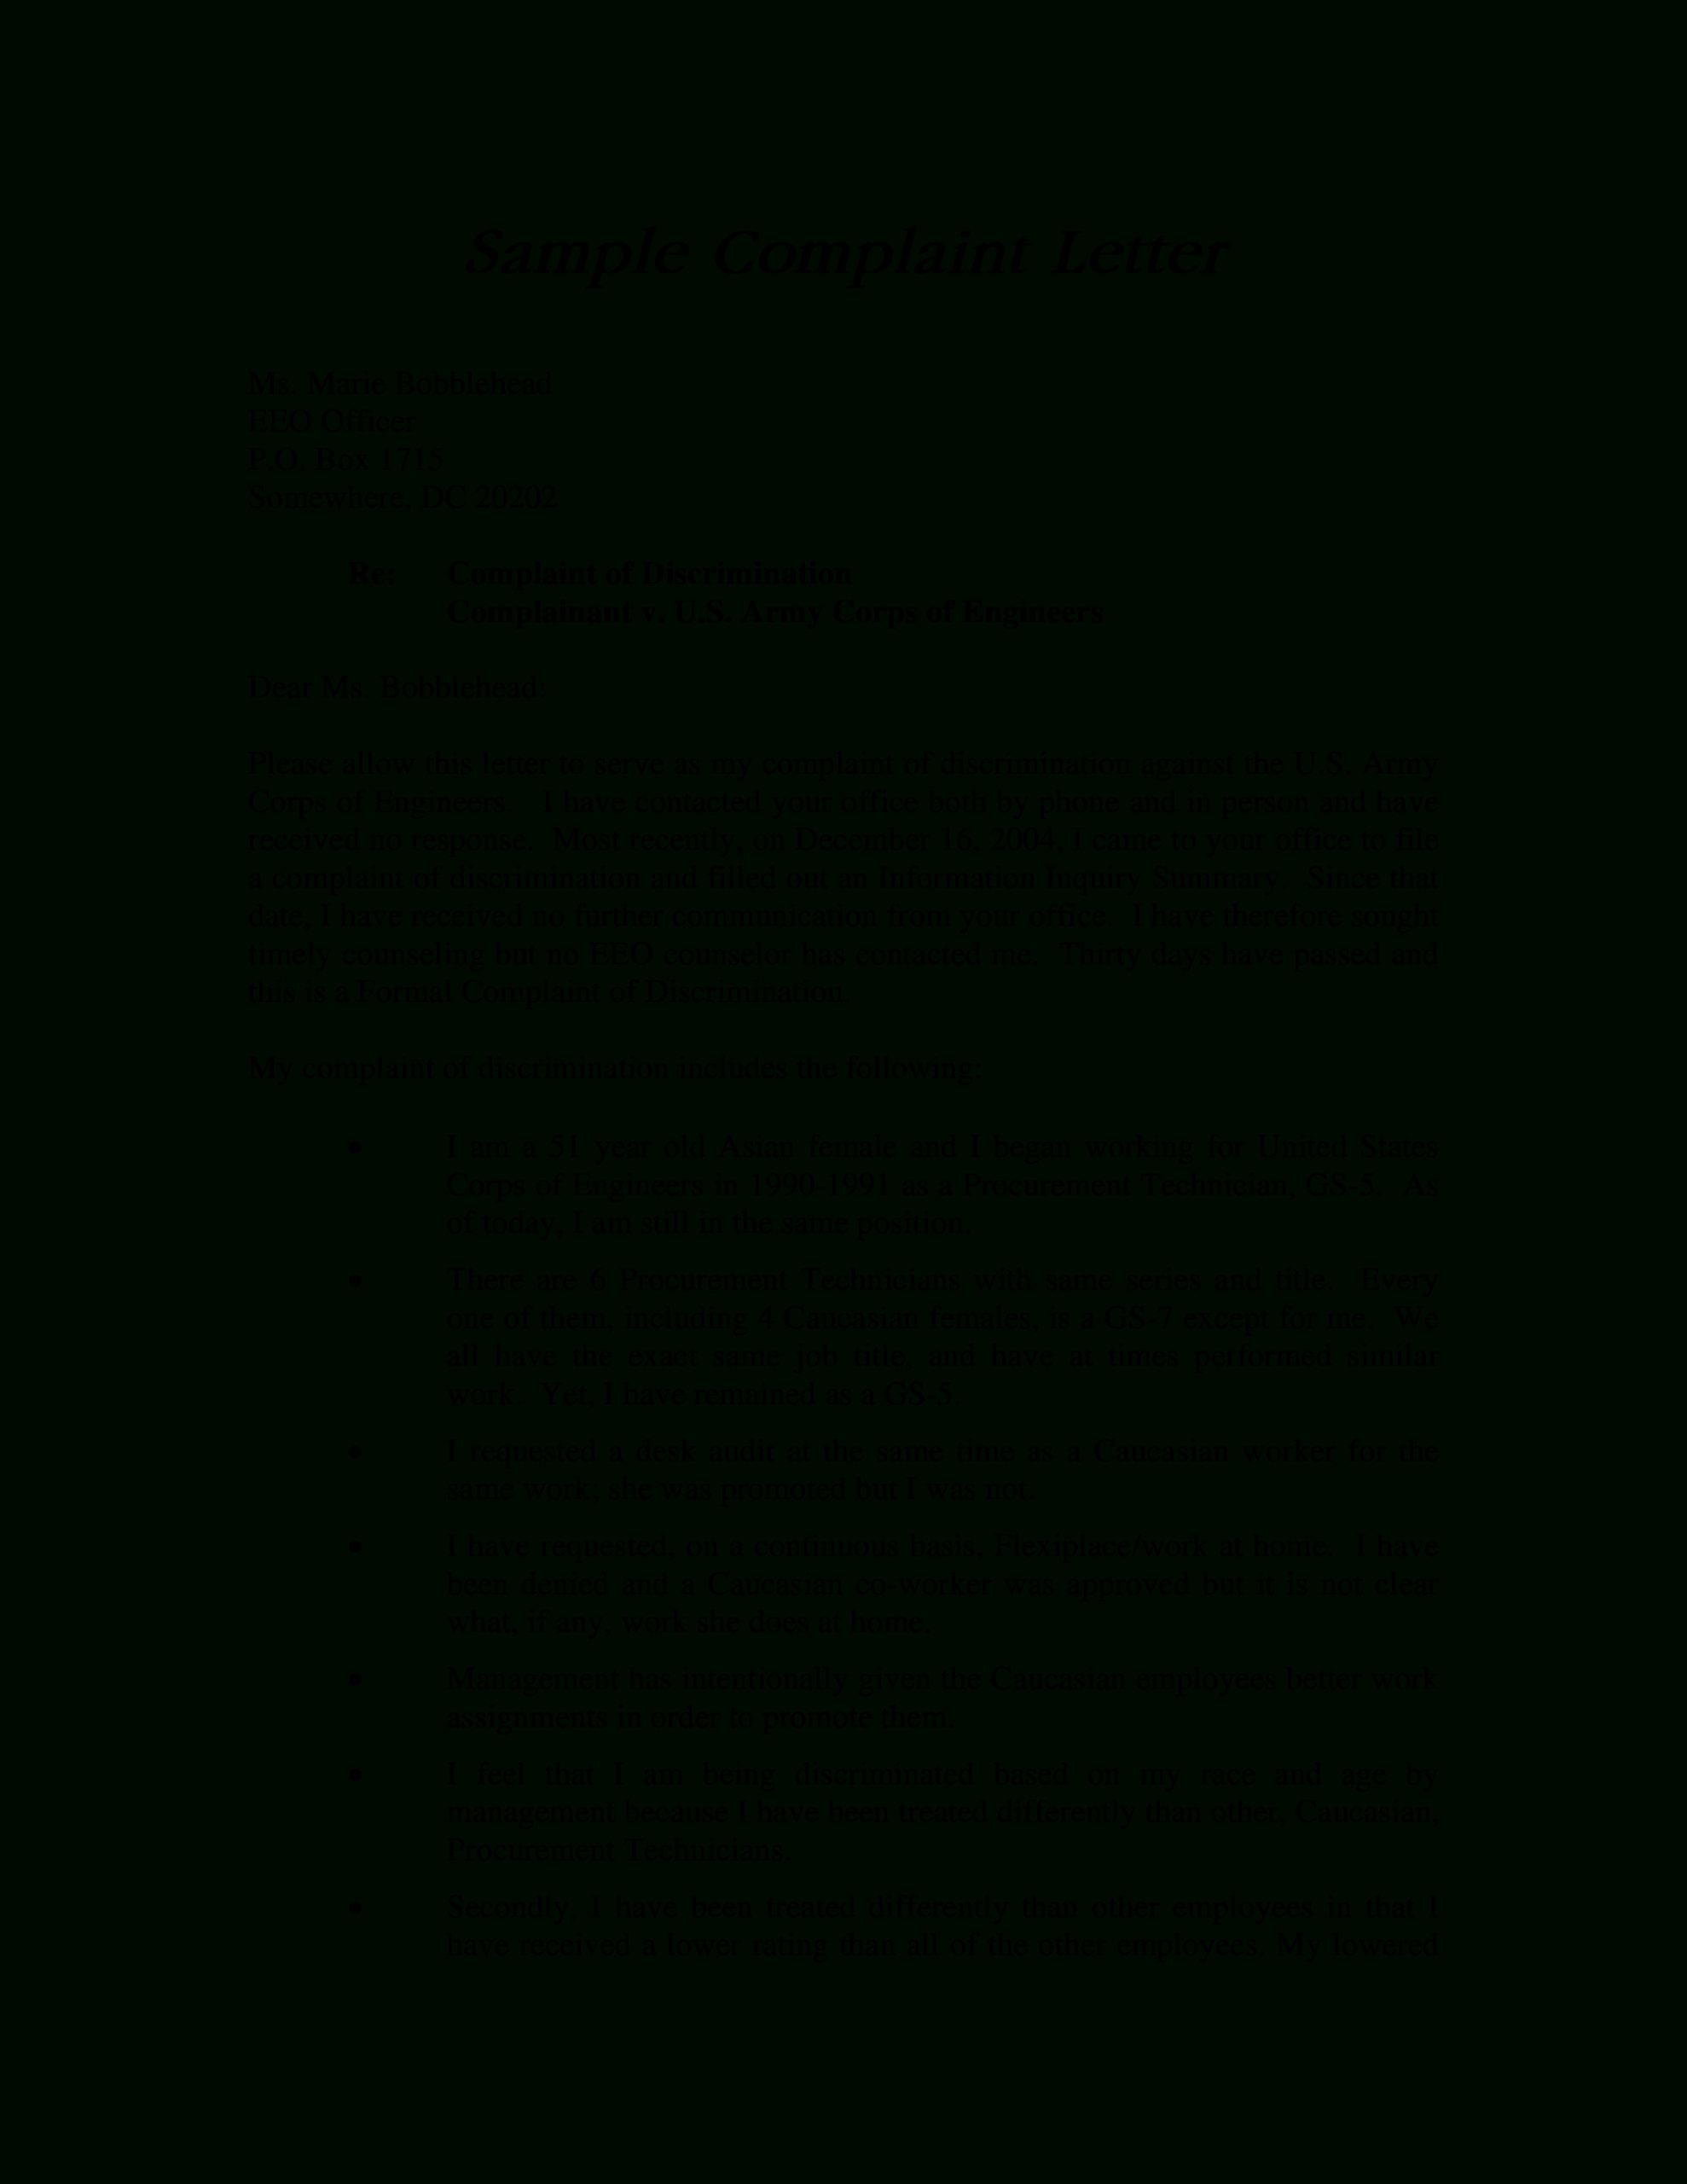 Formal Employee Discrimination Complaint Letter | Templates For Formal Letter Of Complaint To Employer Template